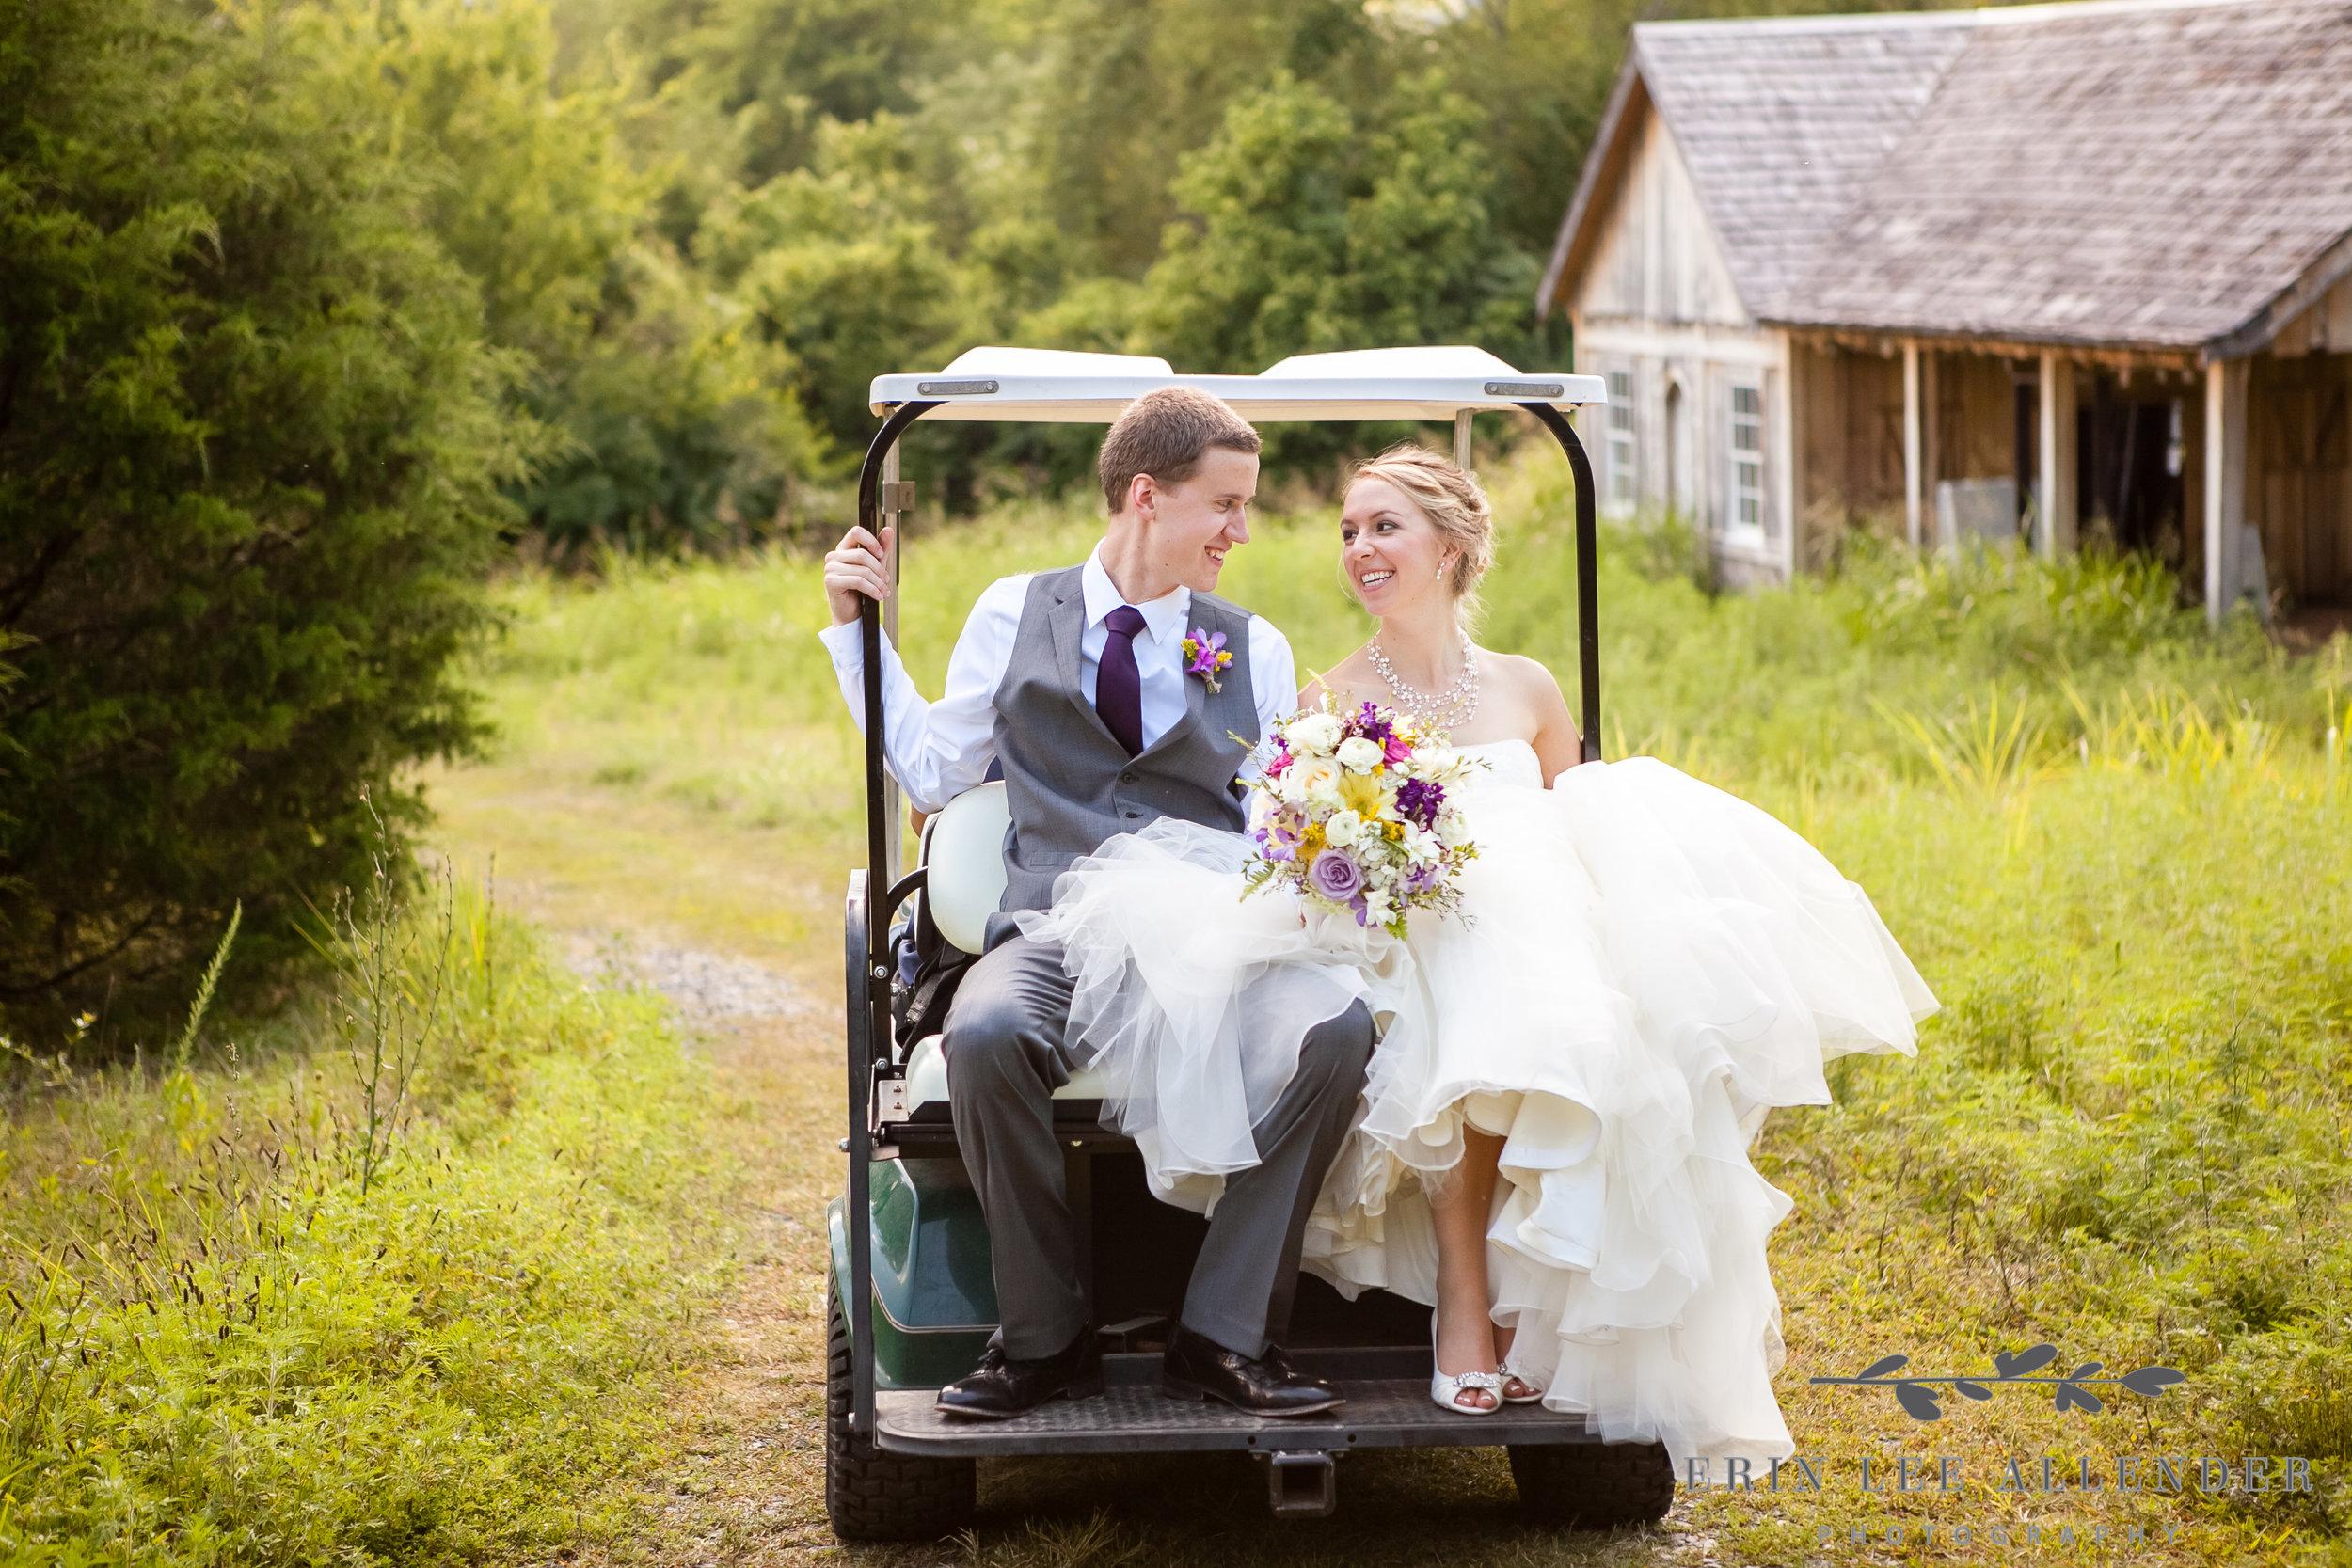 Bride_Groom_in_Golf_Cart